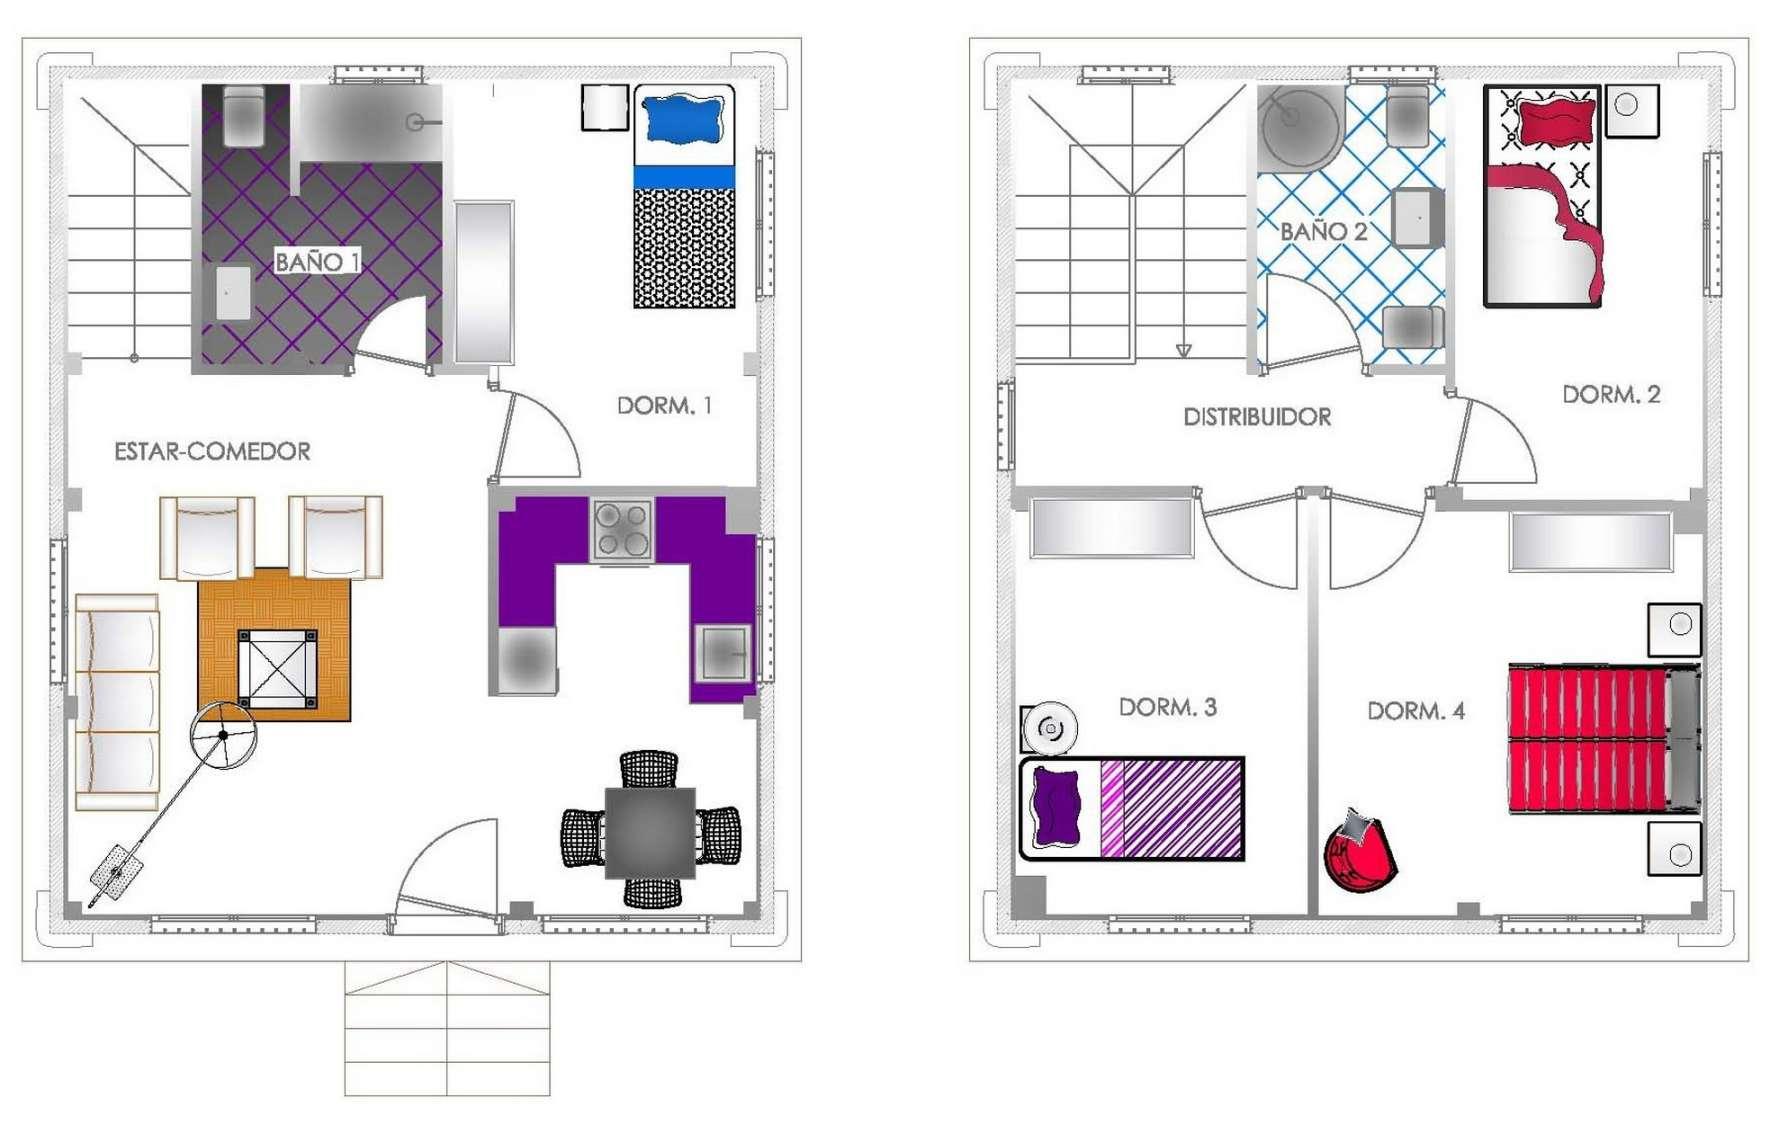 Planos de casas modernas de dos plantas planos y - Disenos de casas de dos plantas ...